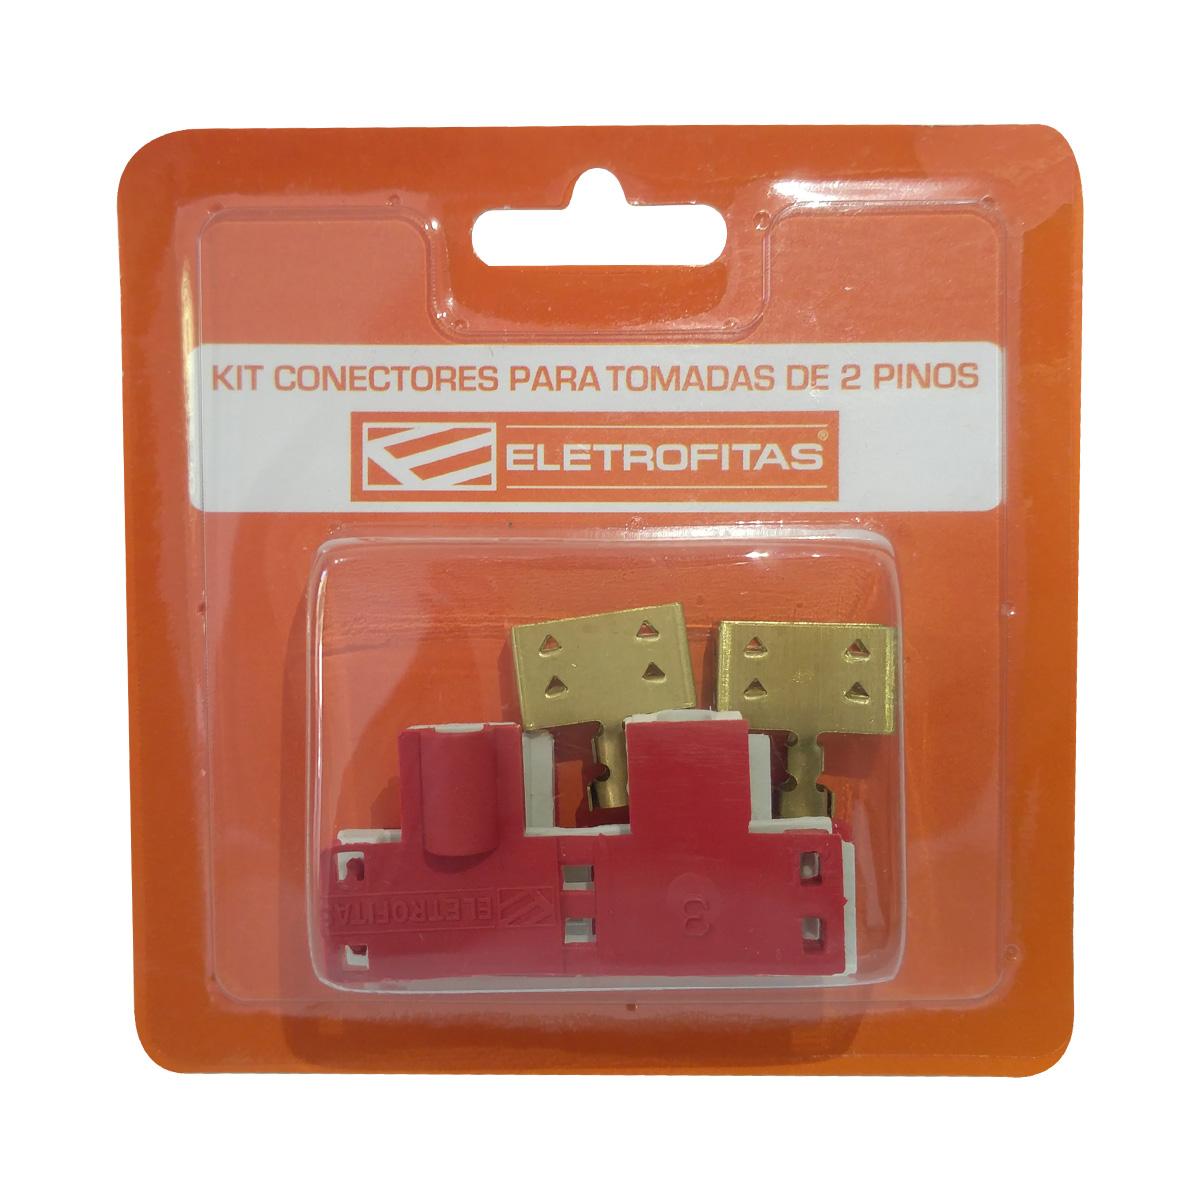 Kit Conectores Eletrofitas 2 Vias 20A - Novo